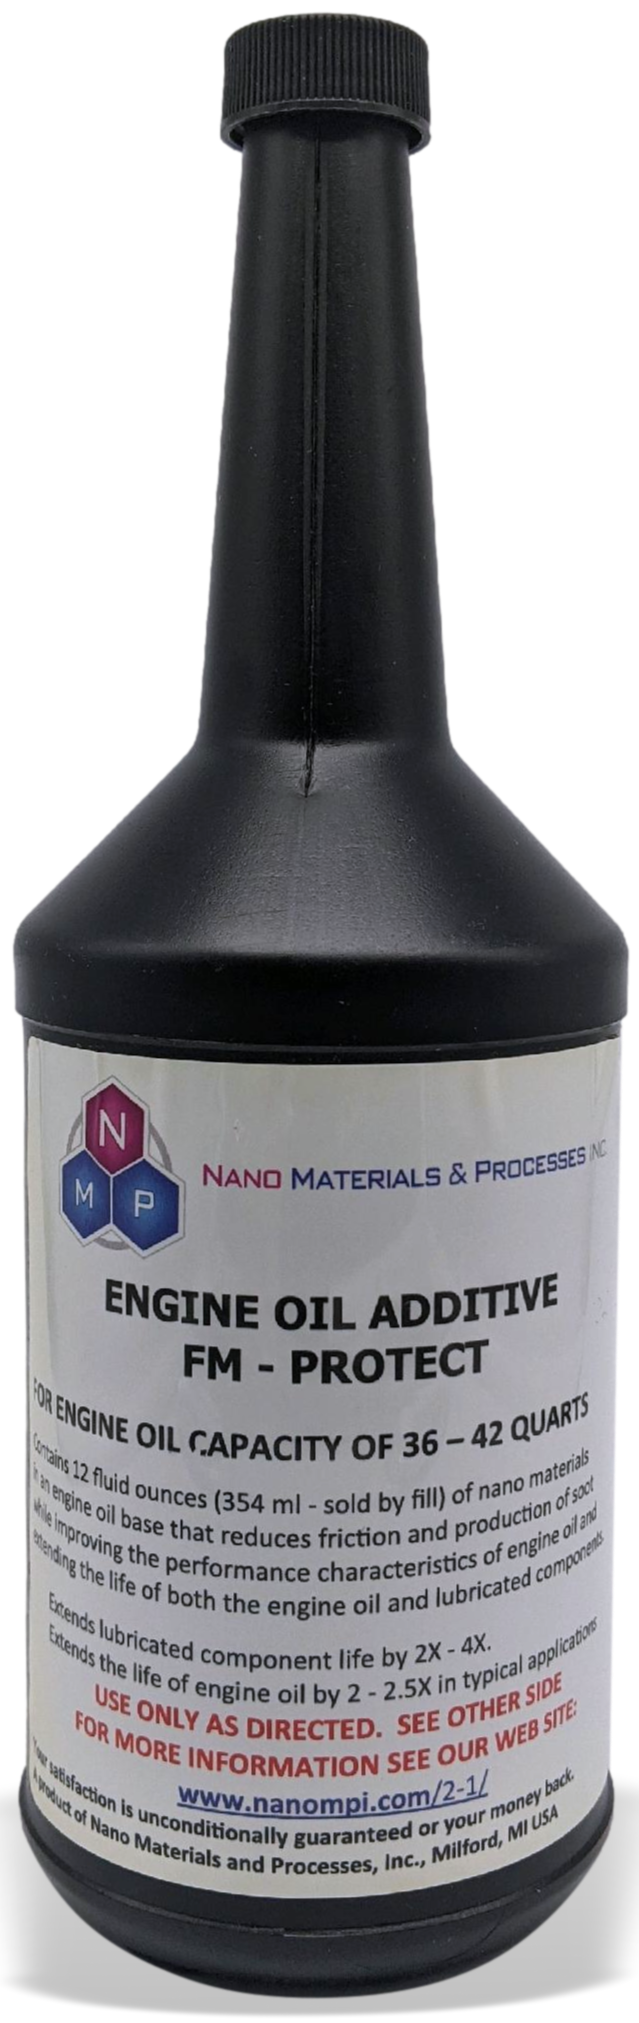 NanoMPI Engine Oil Additive FM-Protect™